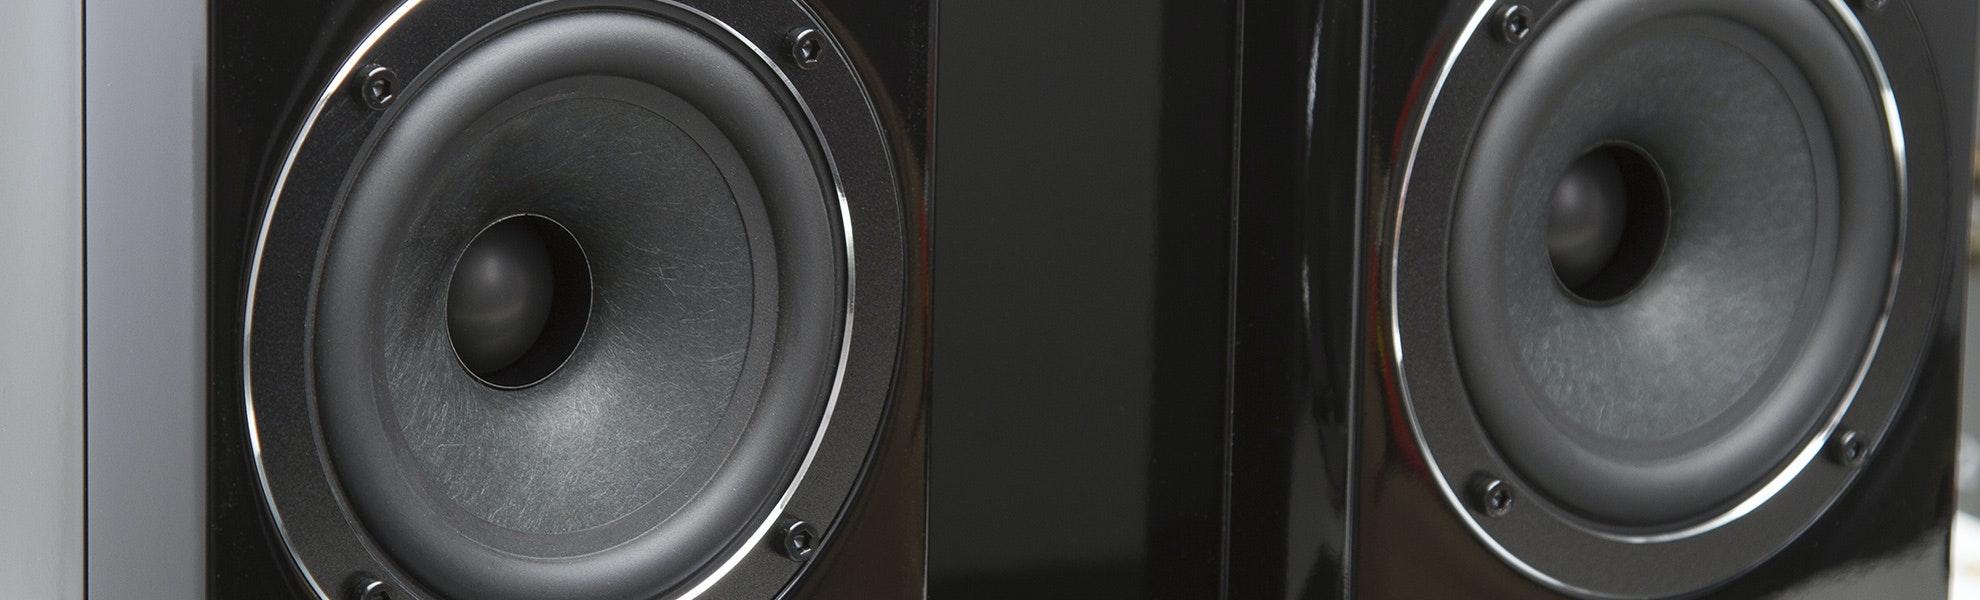 CEntrance MasterClass 2504 Speakers